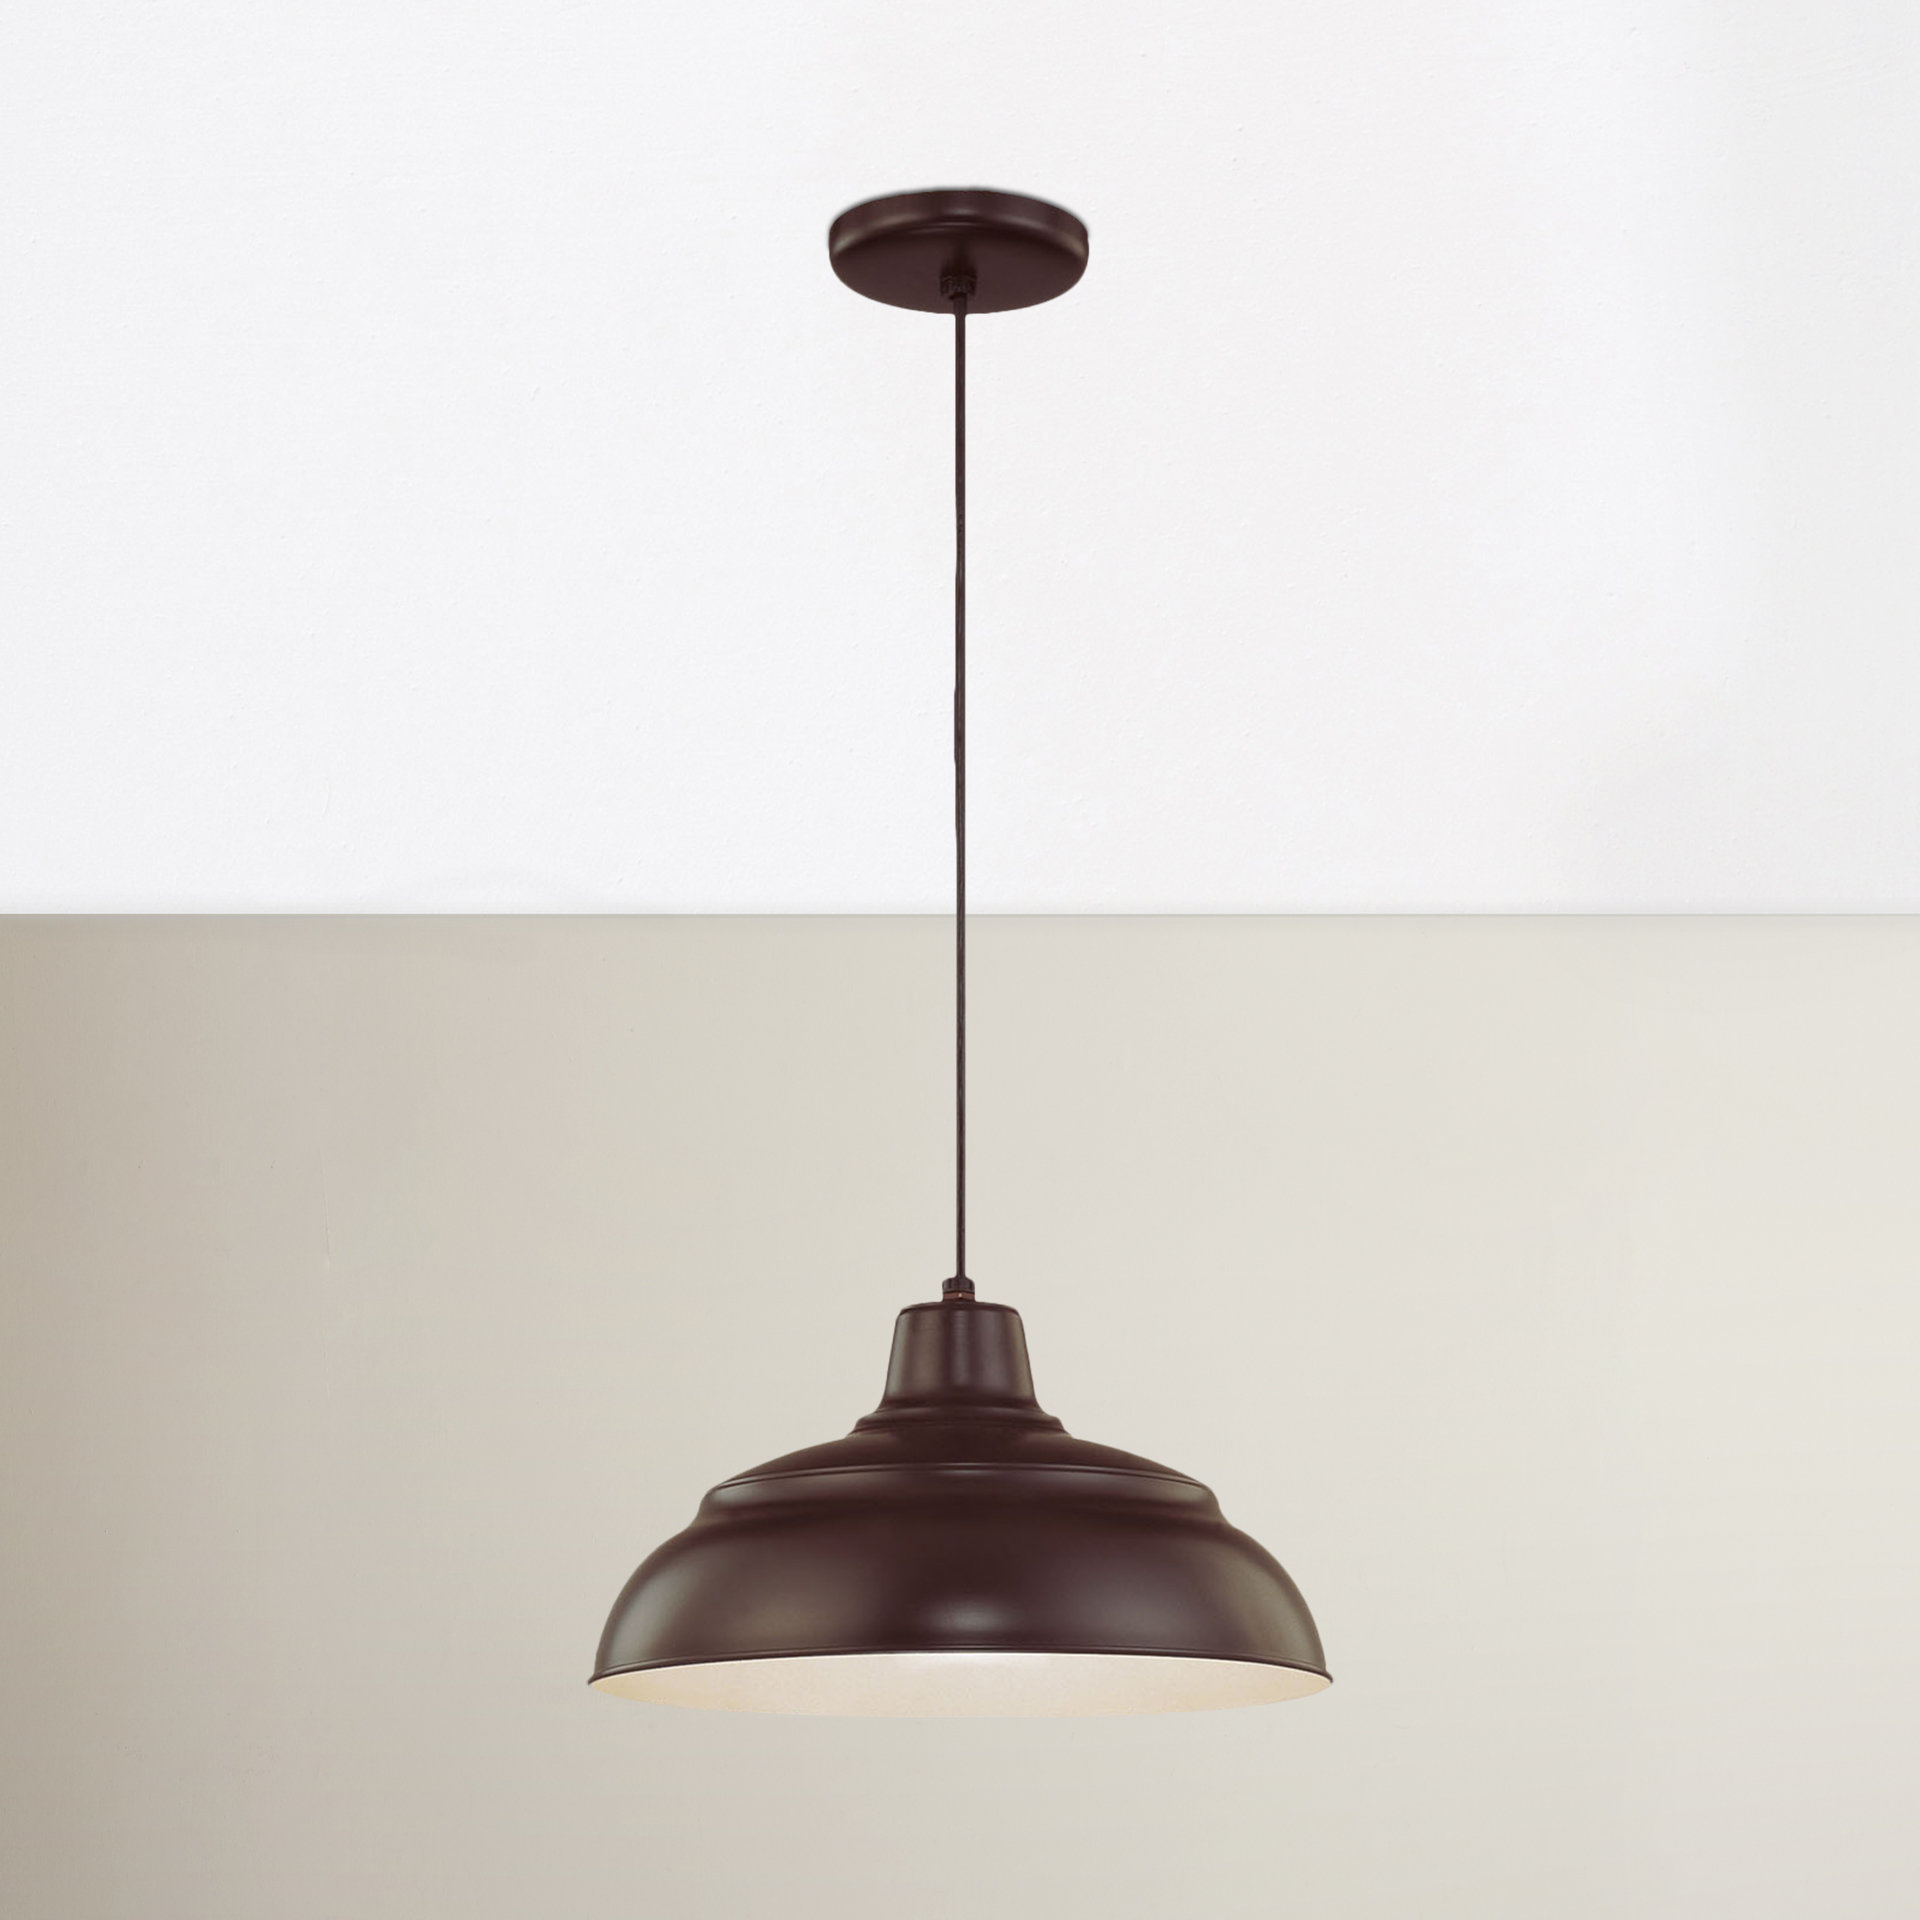 Stetson 1-Light Bowl Pendant intended for Southlake 1-Light Single Dome Pendants (Image 29 of 30)